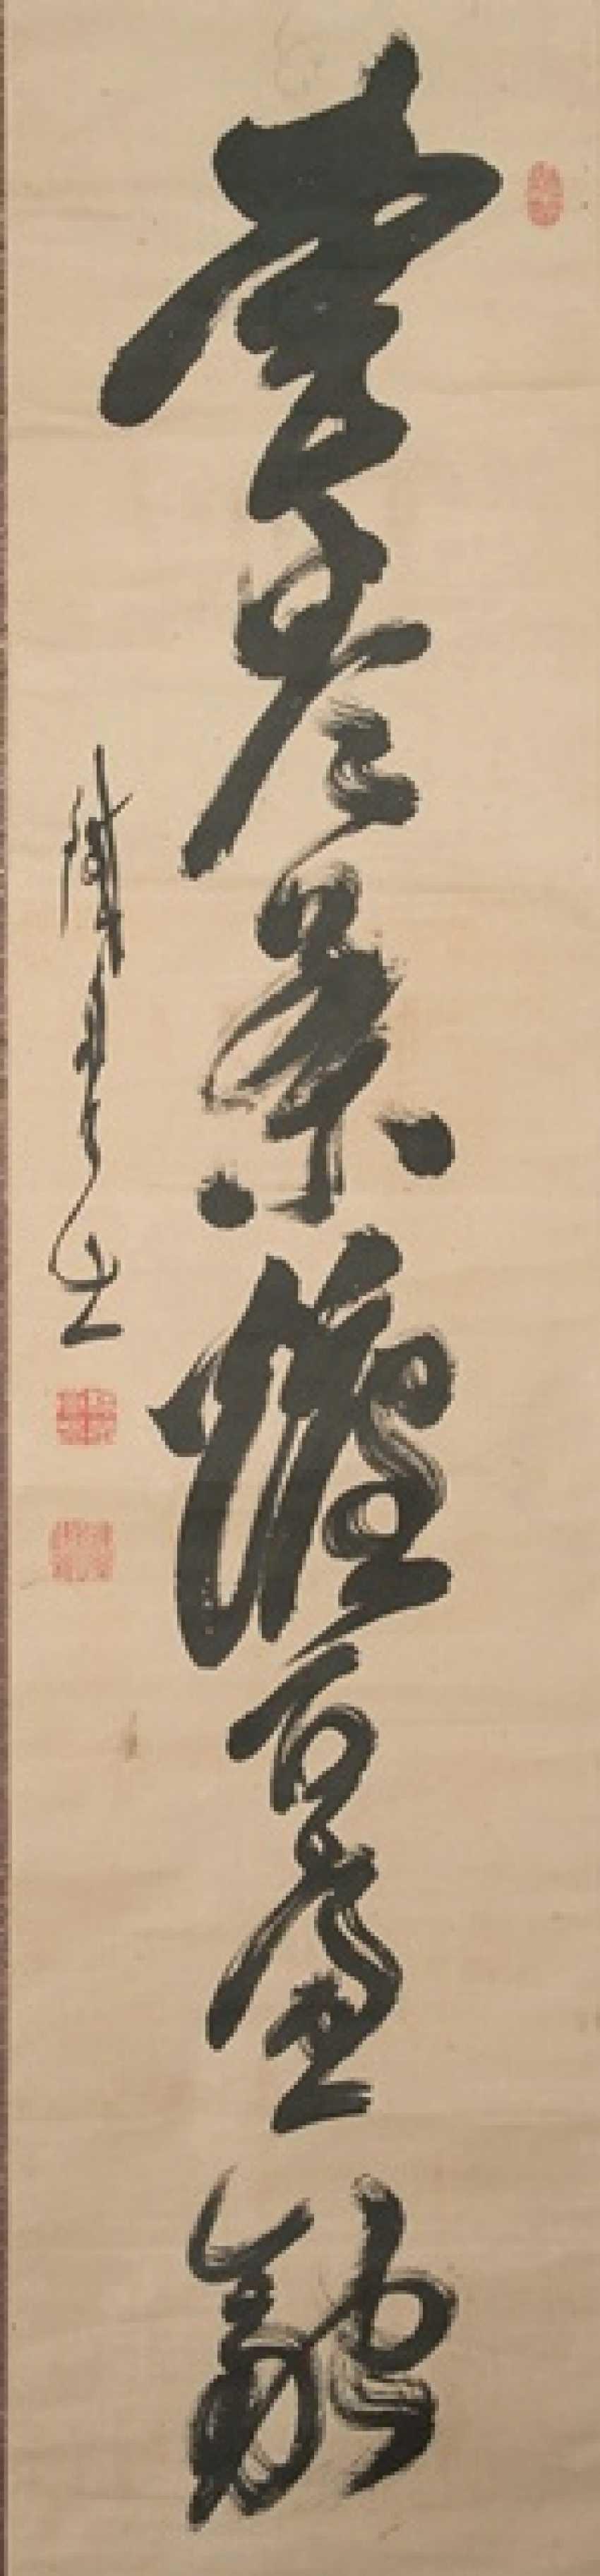 Yamaoka Tesshû - photo 1